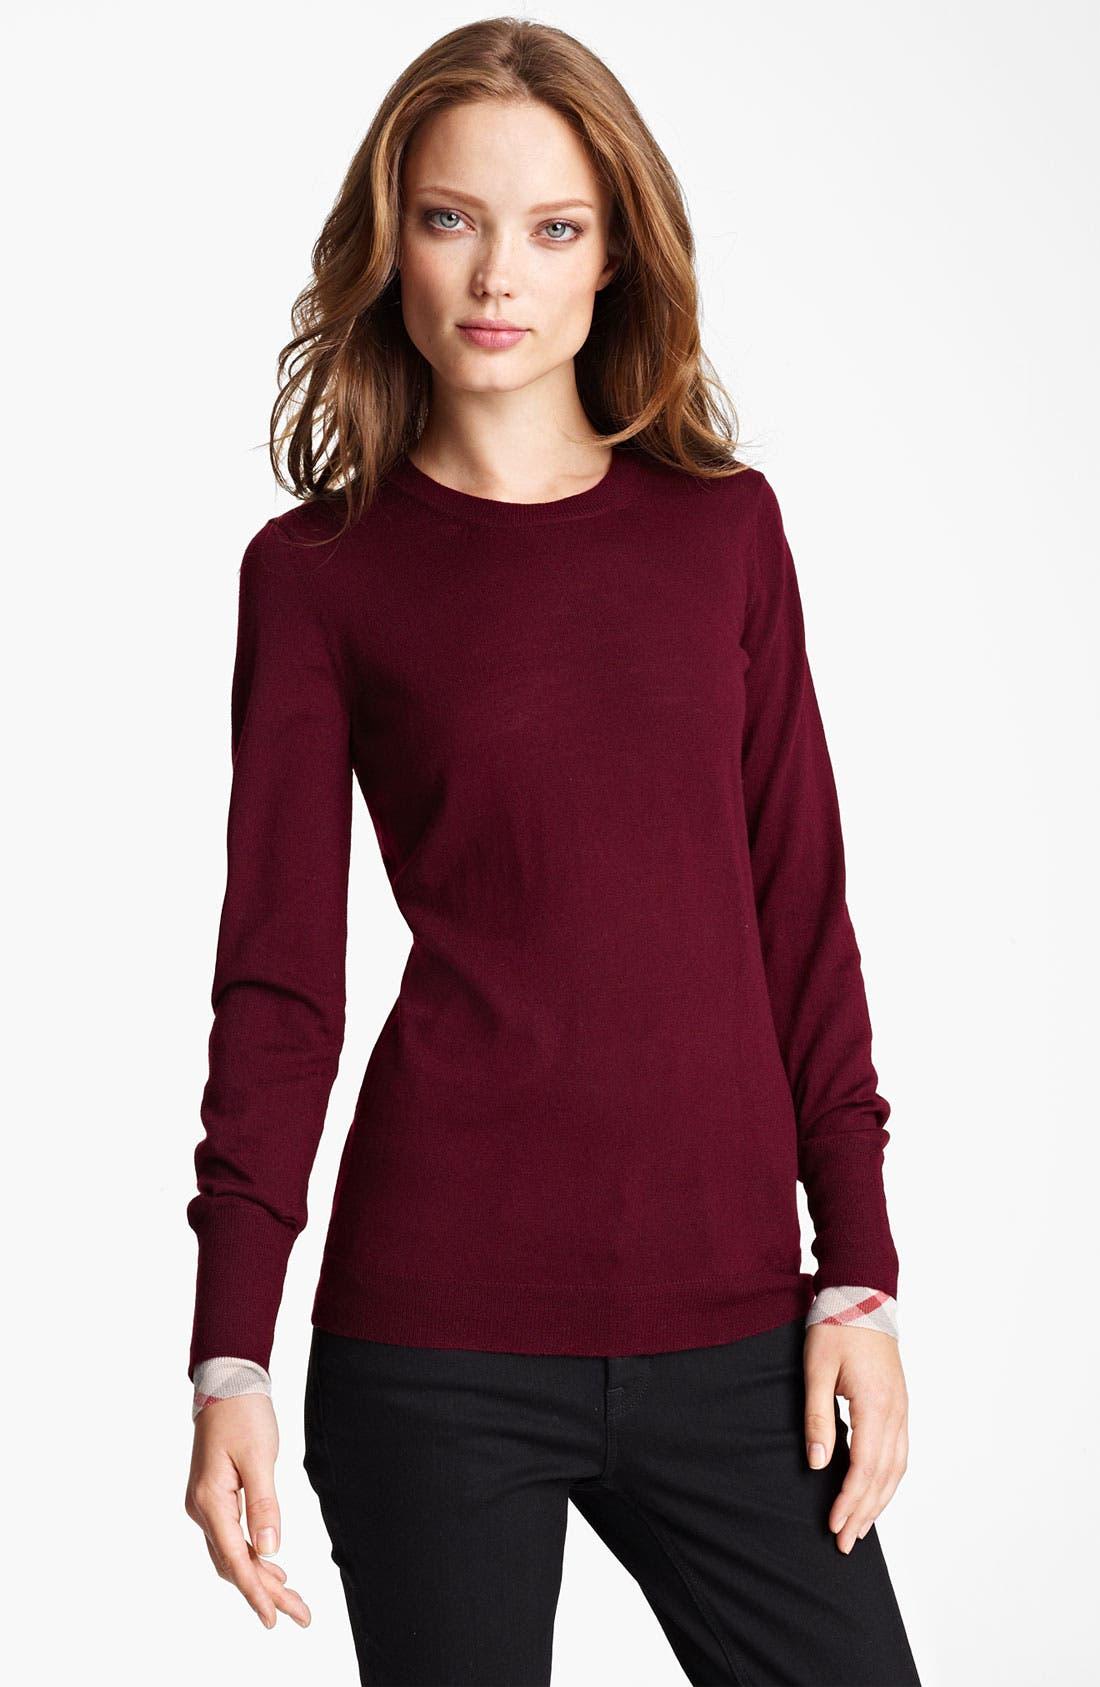 Alternate Image 1 Selected - Burberry Brit Merino Wool Sweater